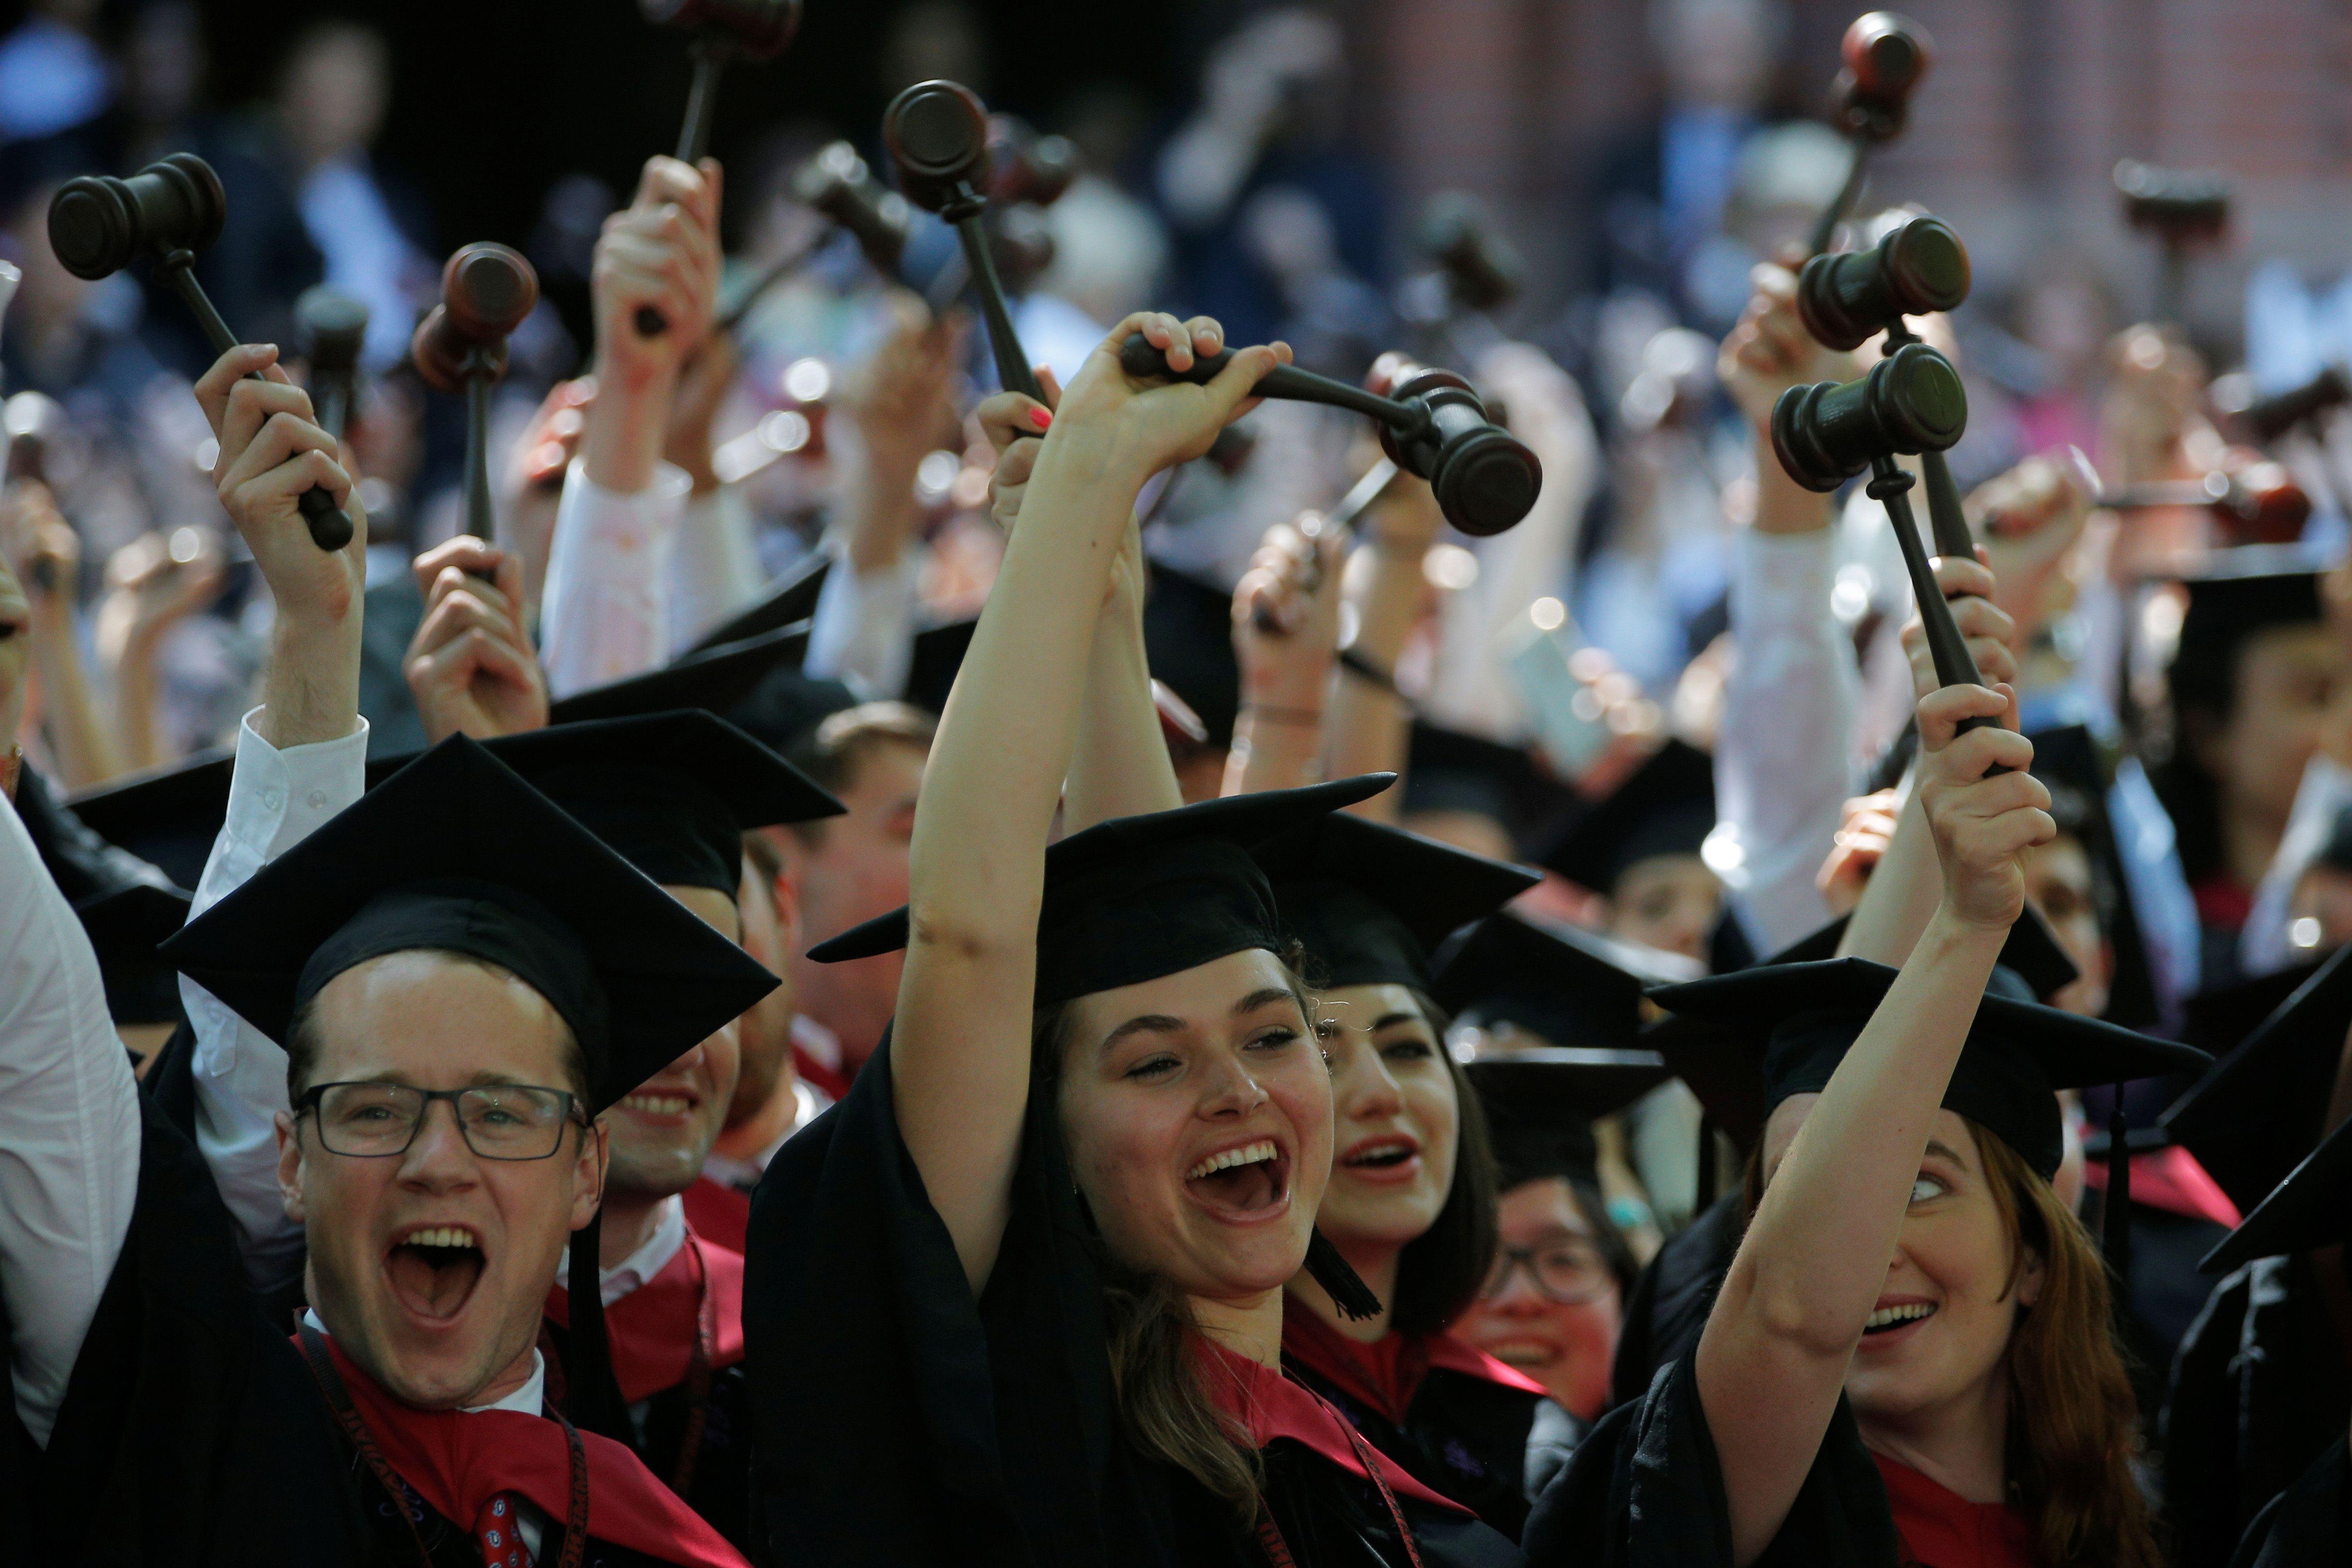 JK universitetai gvildena �Brexit� padarinius auk�tajam mokslui